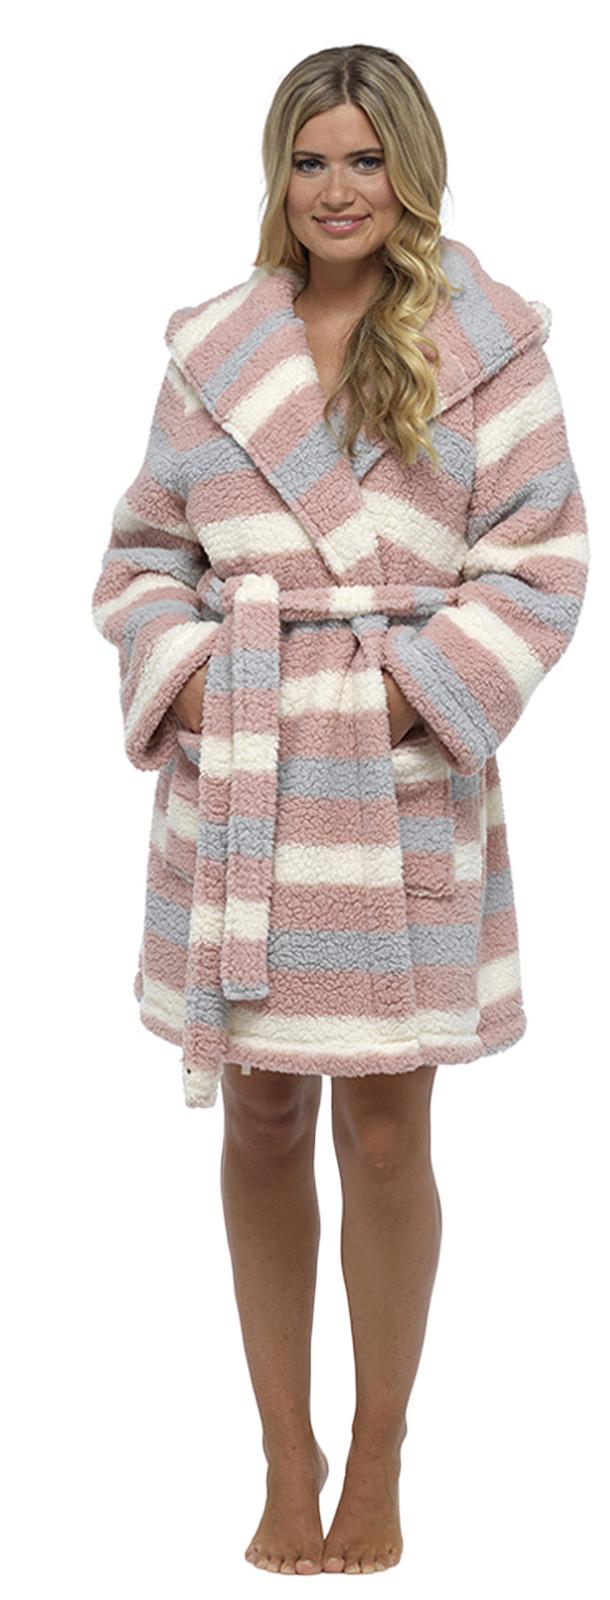 Womens Hooded Sherpa Soft Snuggle Dressing Gown Short Bath Robe ... e576f86c70